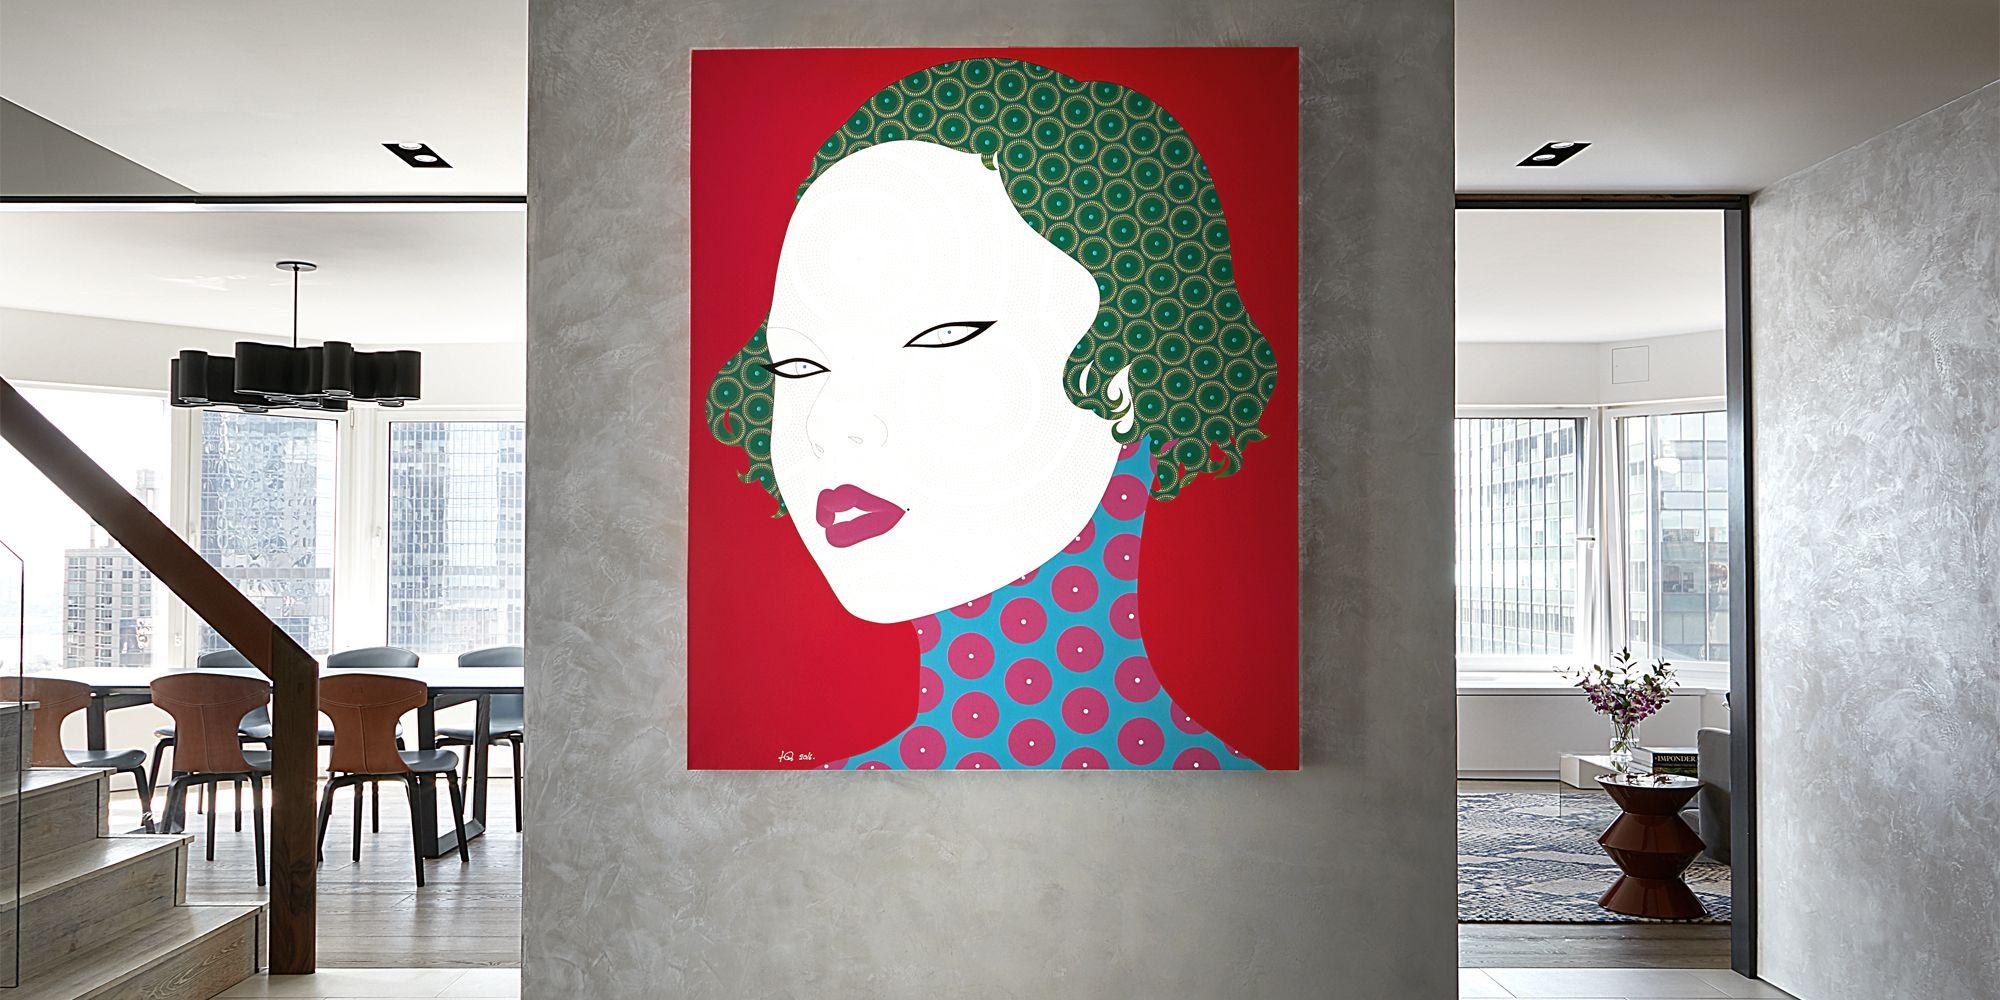 35 Entryways with Impressive Artwork